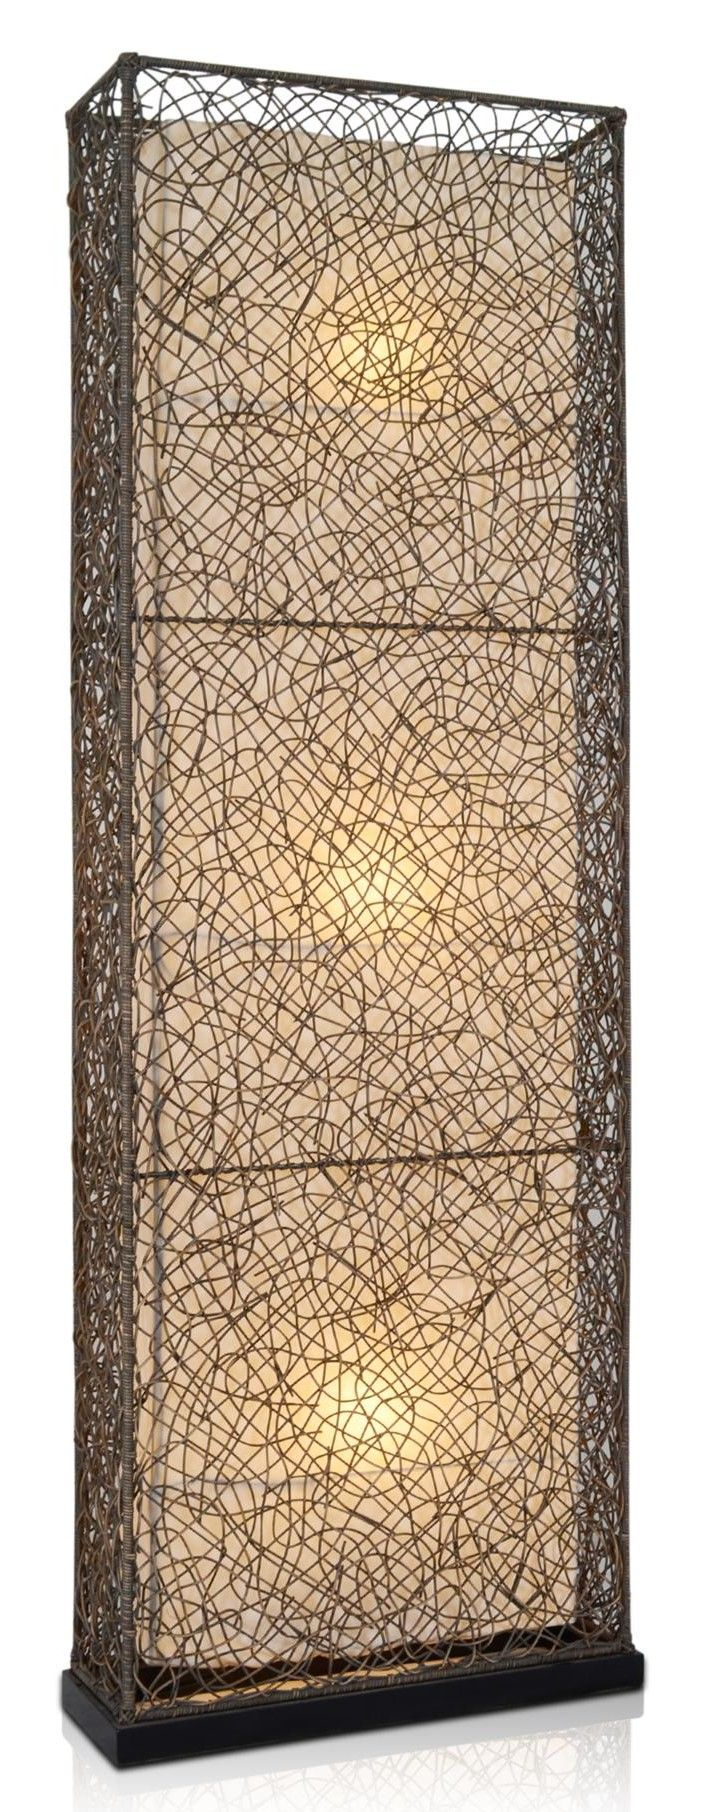 "Lumina 71"" Floor Lamp"